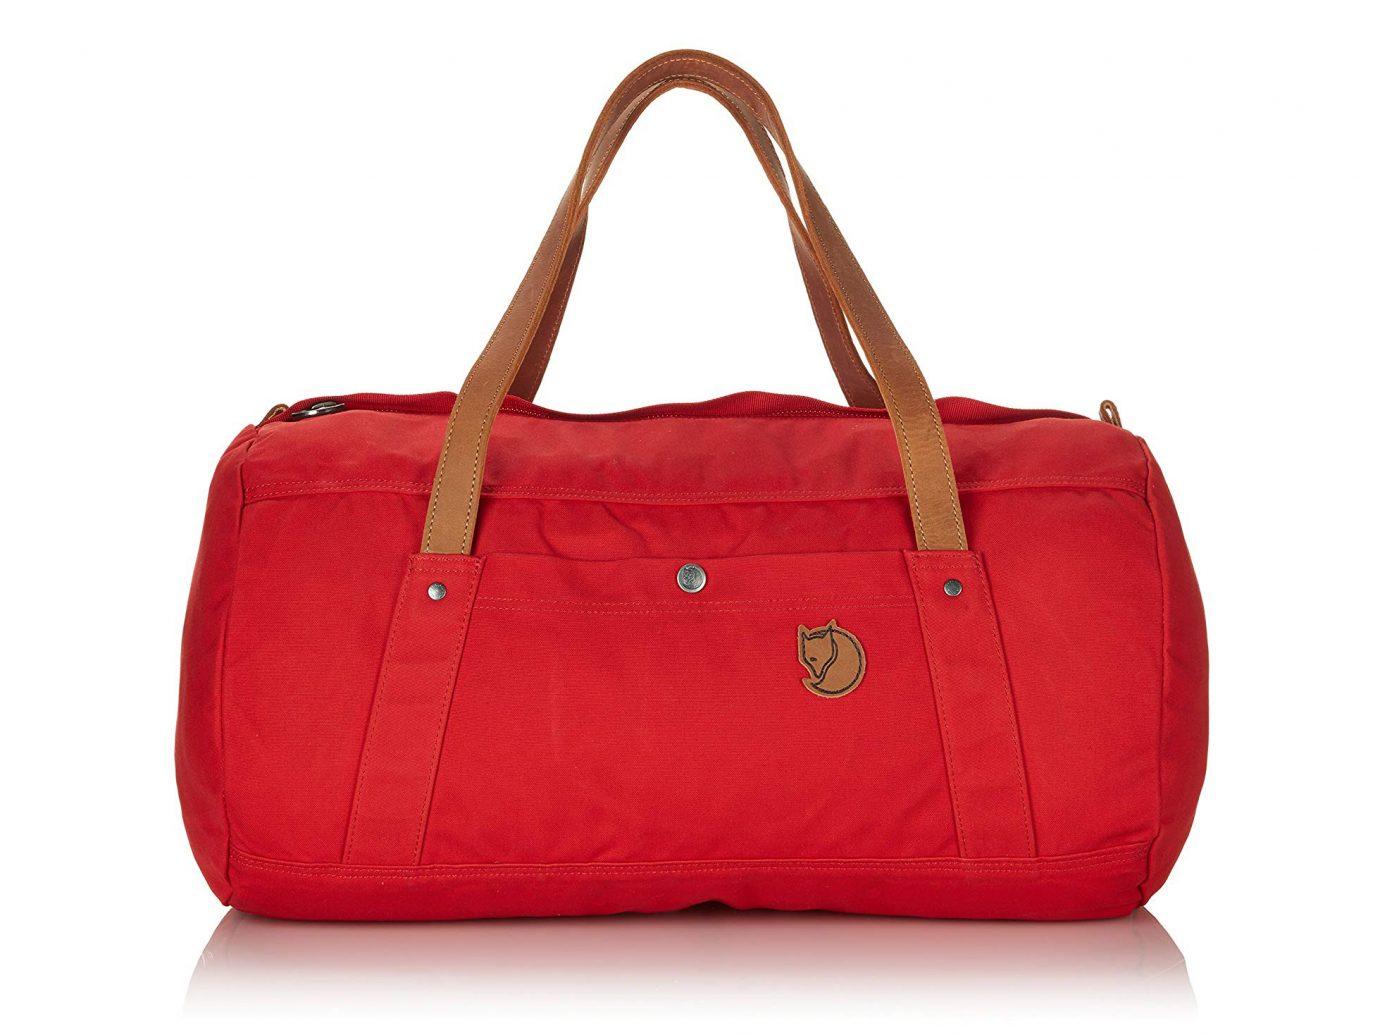 0e547024354e 14 Best Duffel Bags for Travel